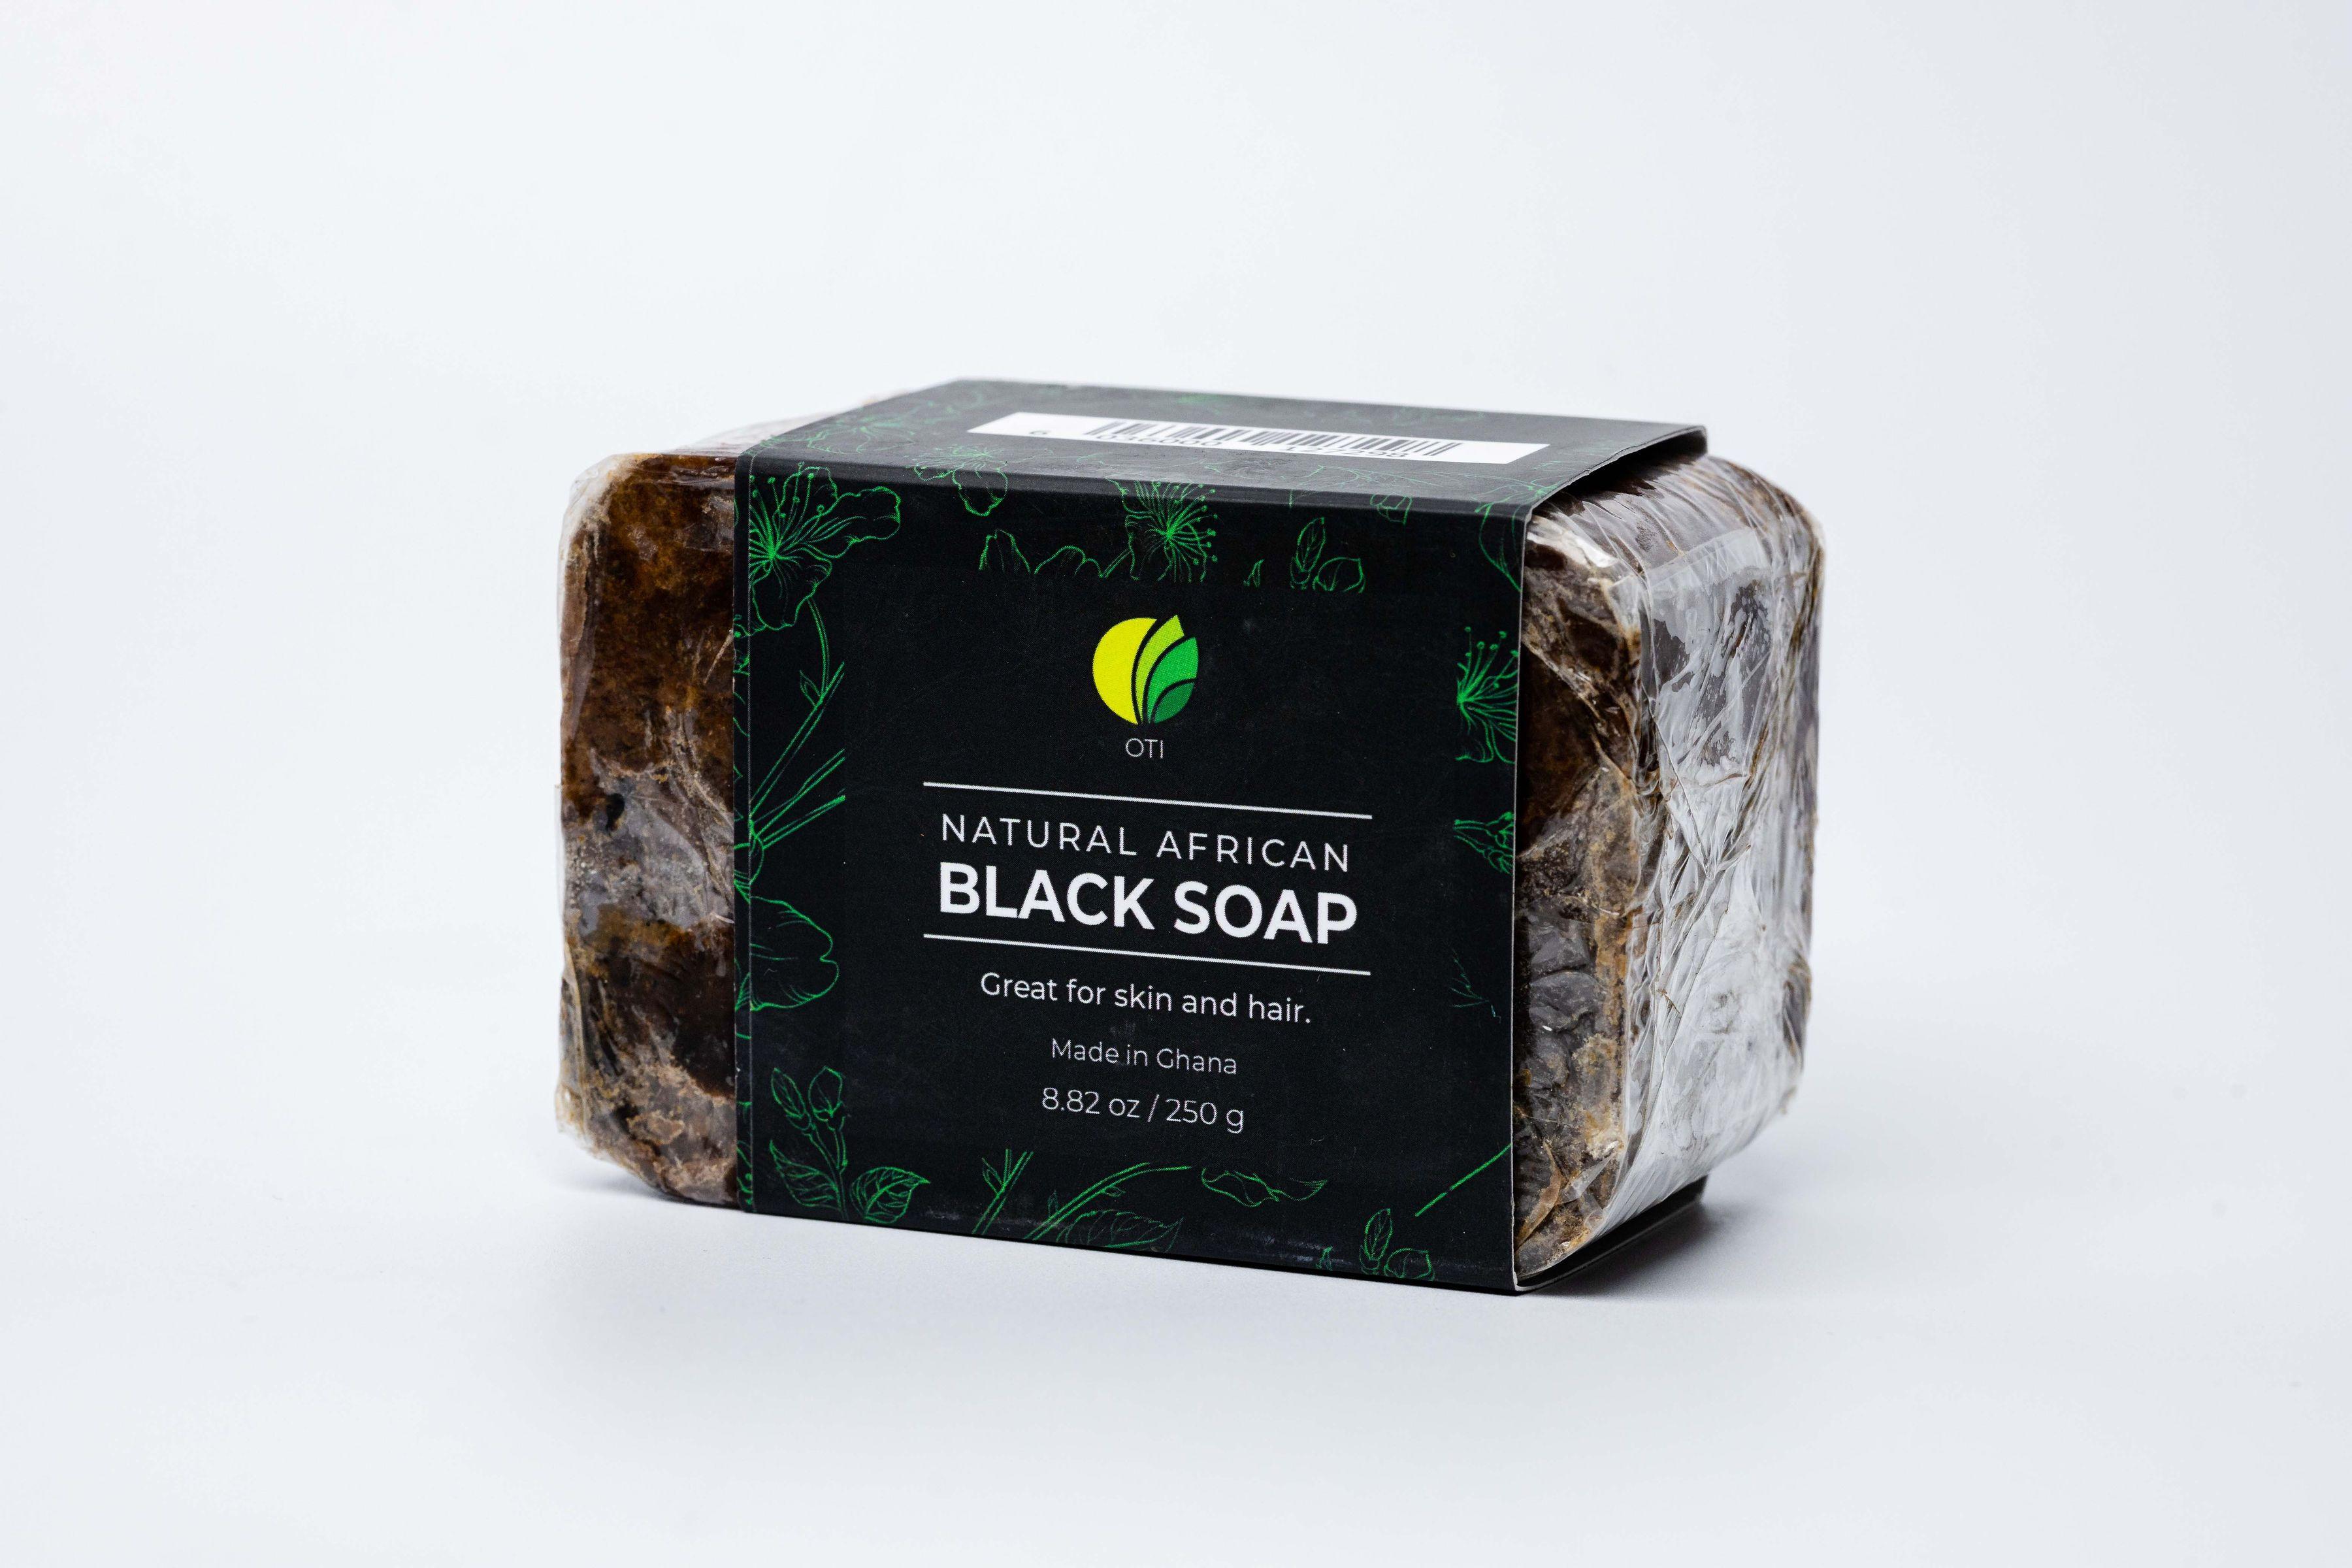 OTI African Black Soap from Ghana (100% Natural)